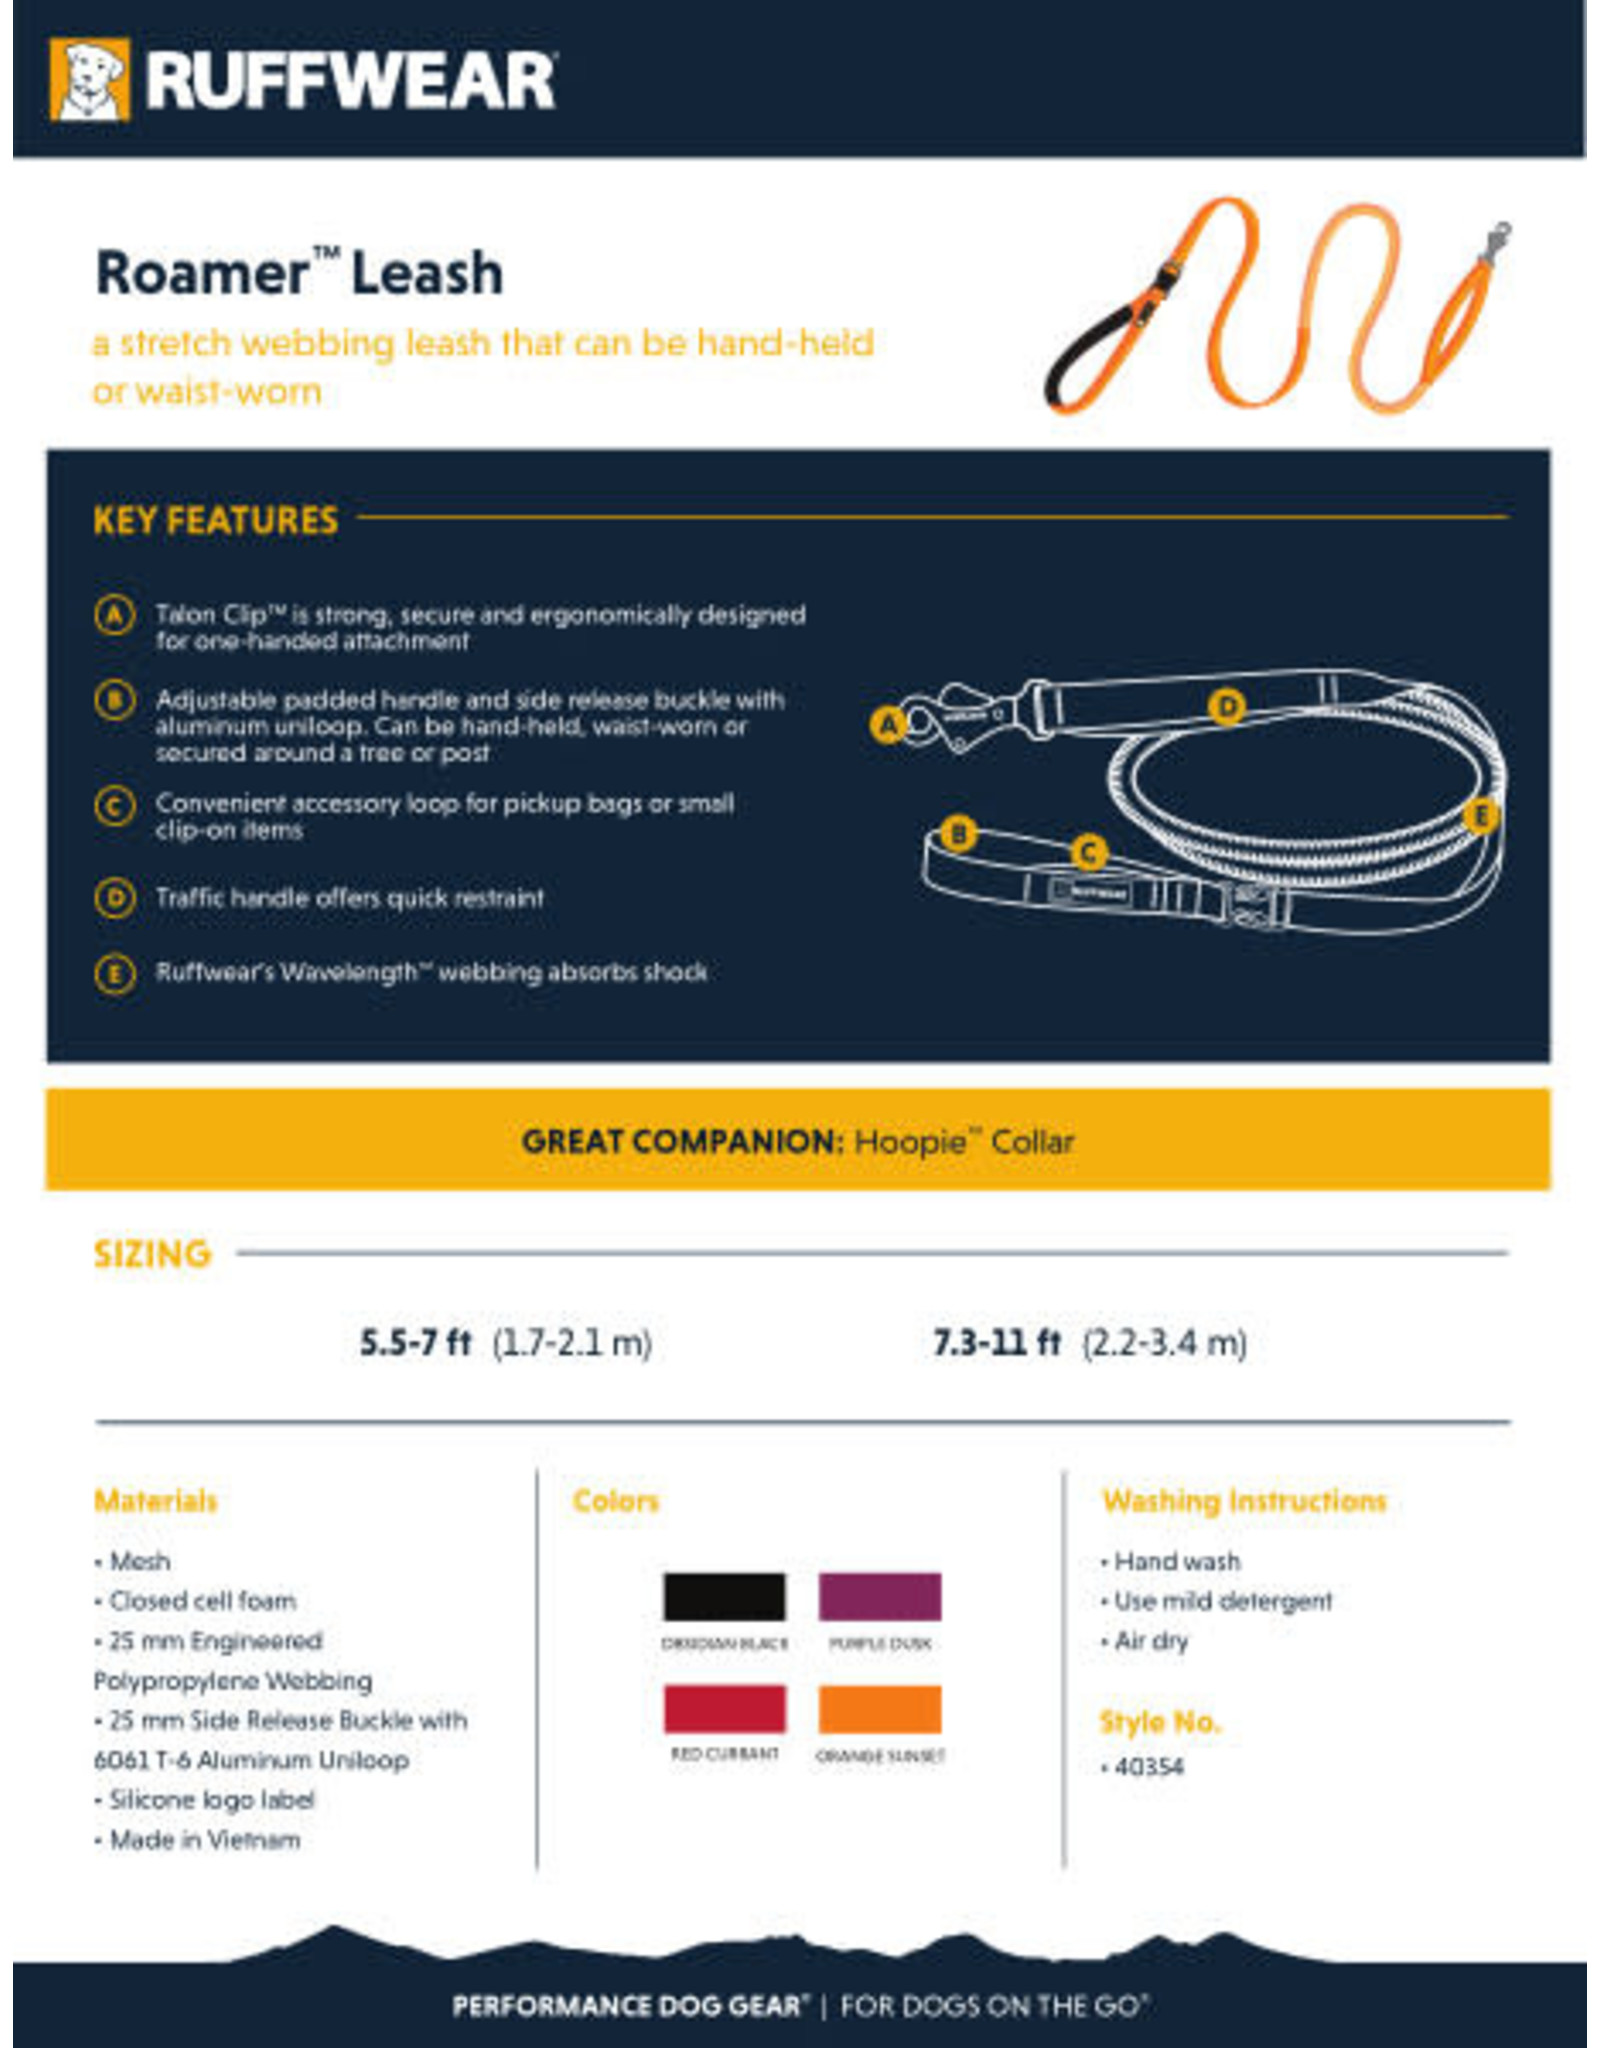 Ruffwear Roamer Leash: Orange Sunset, 7.3 - 11 ft